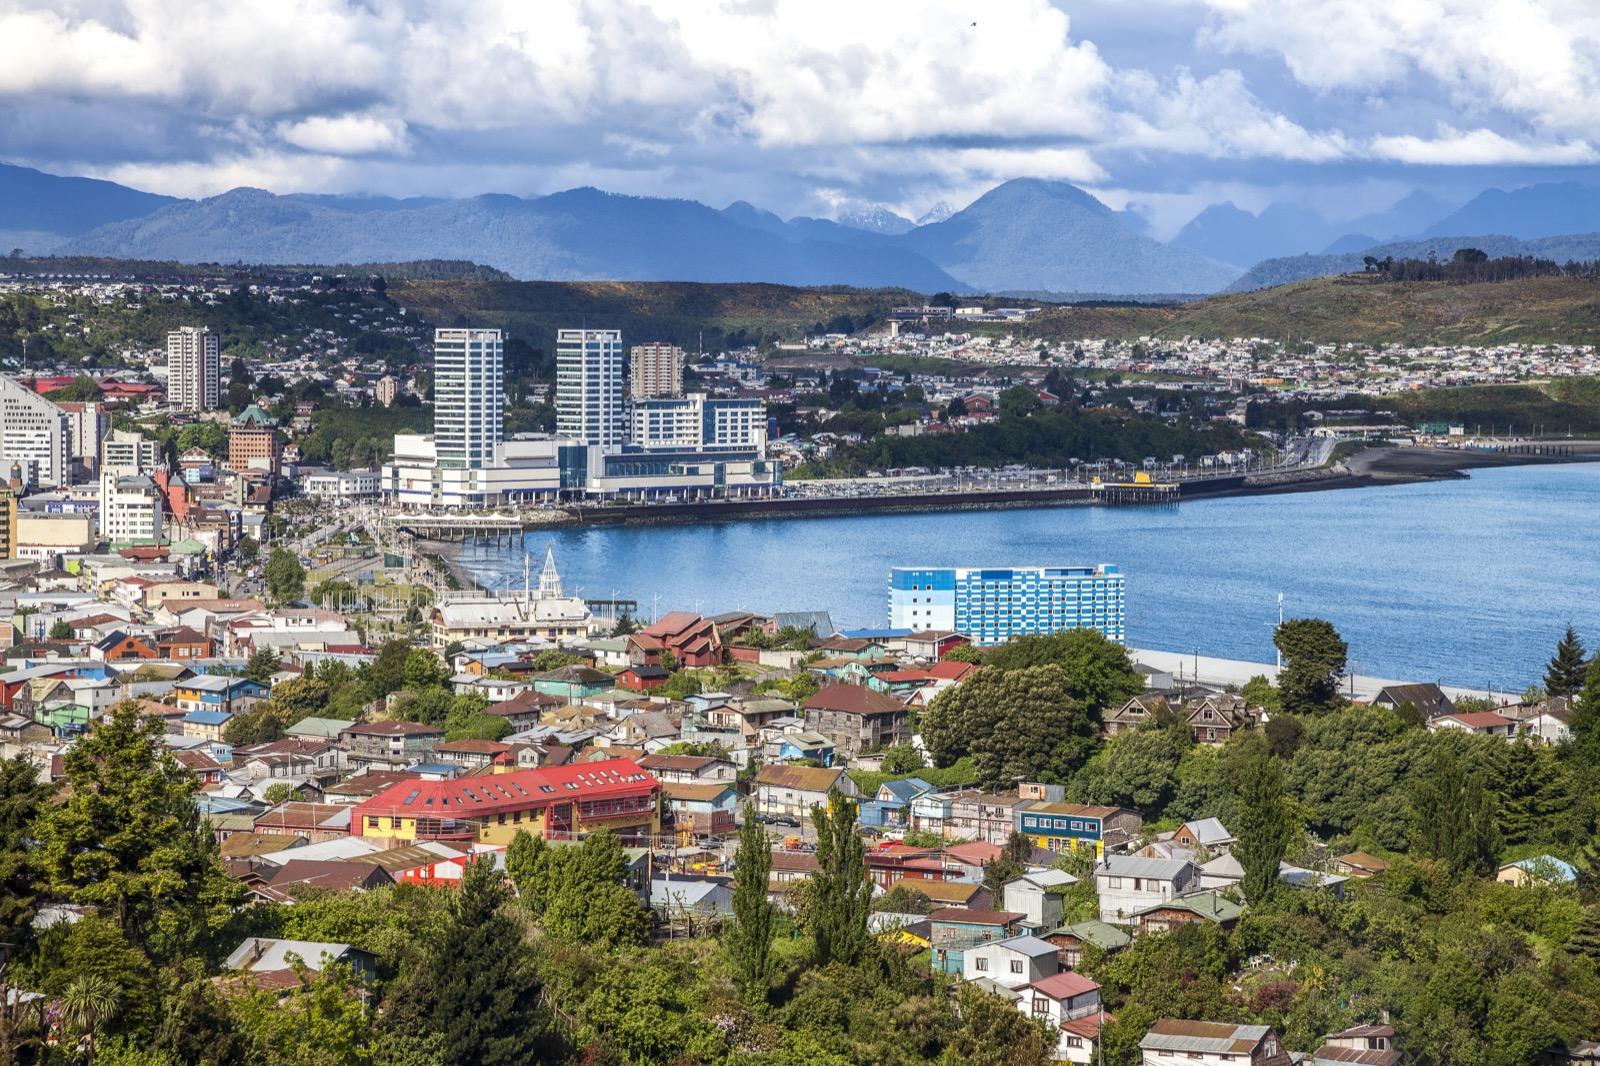 Puerto Montt & Puerto Varas tour